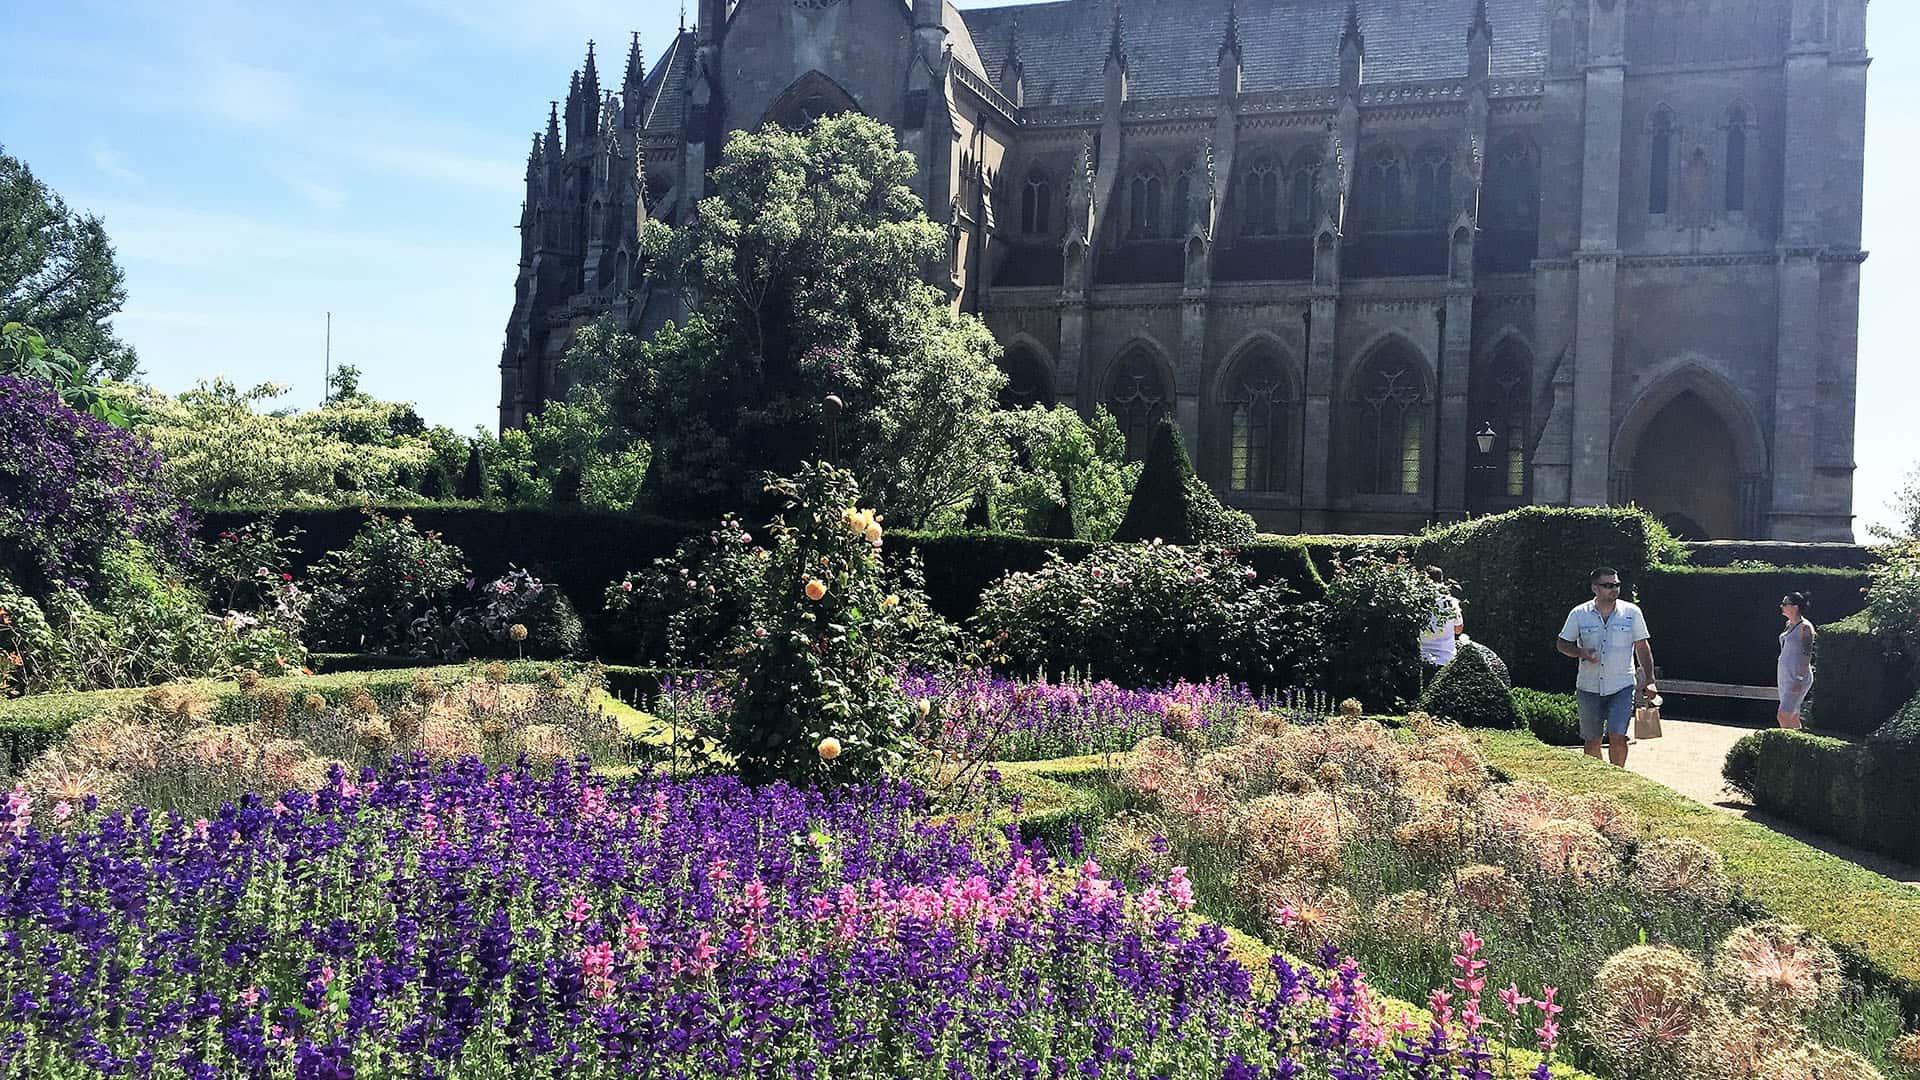 Gardens outside Arundel Castle